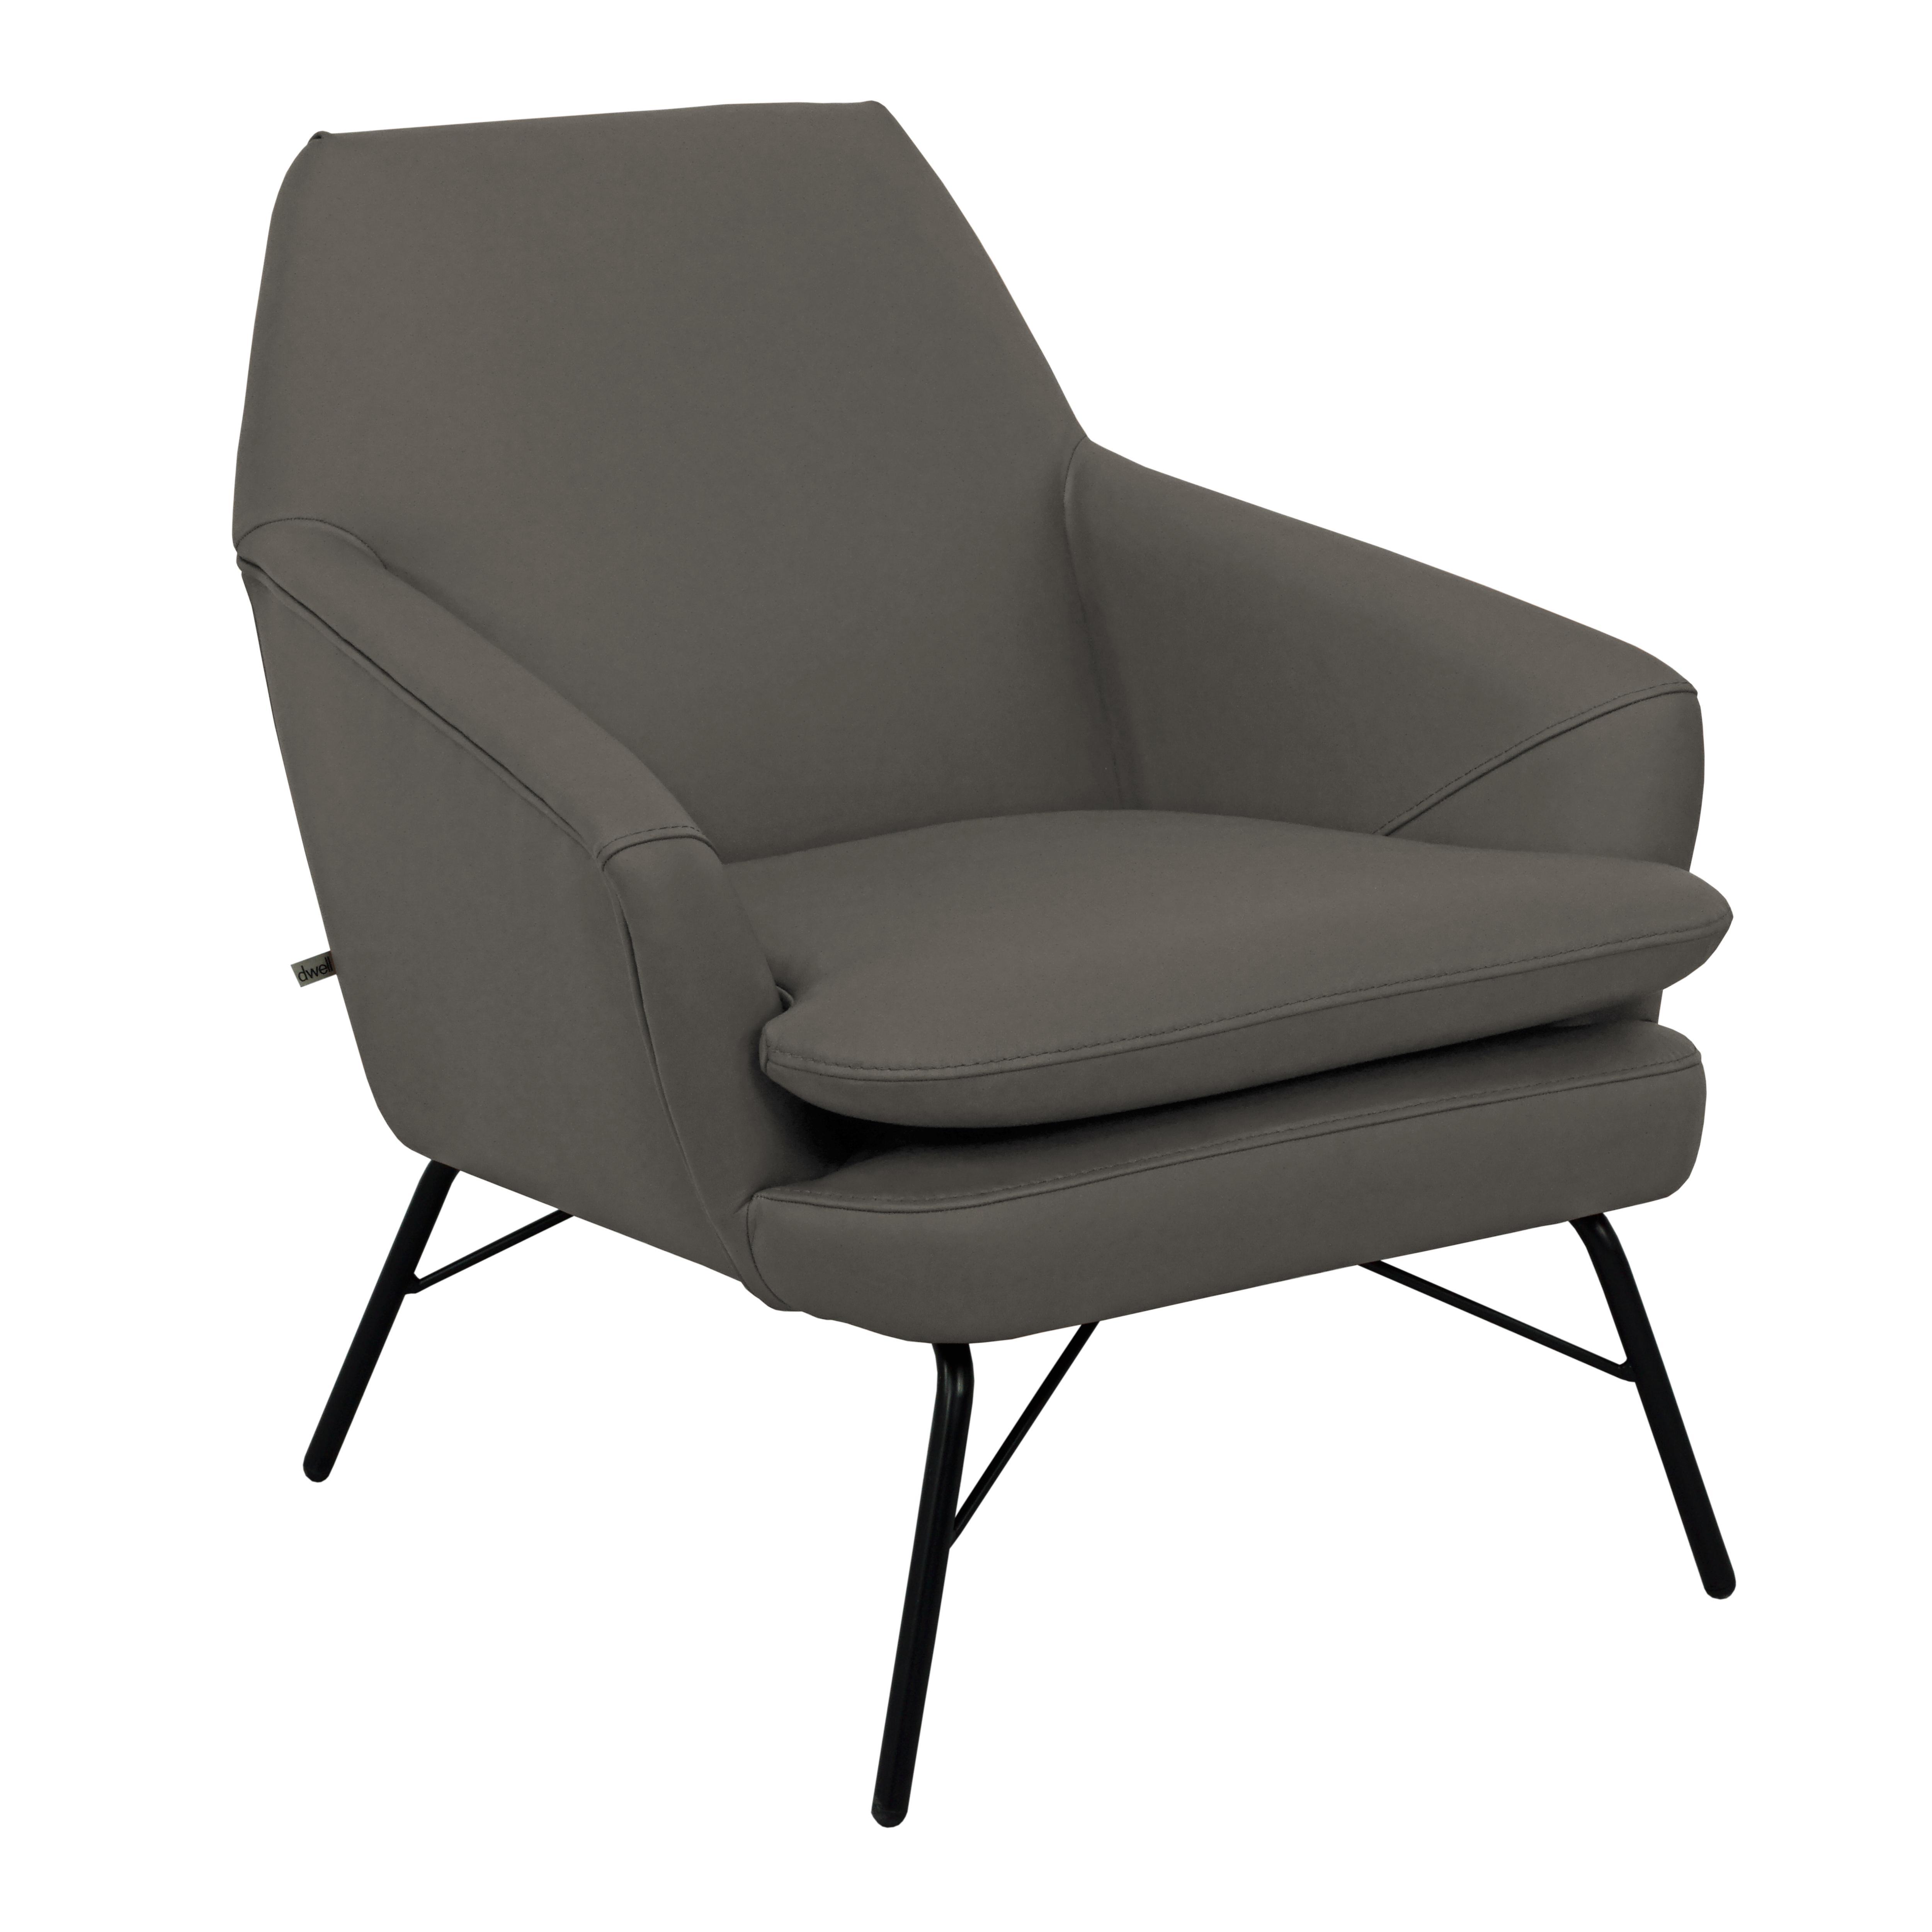 Acuta accent chair mollis leather dark grey